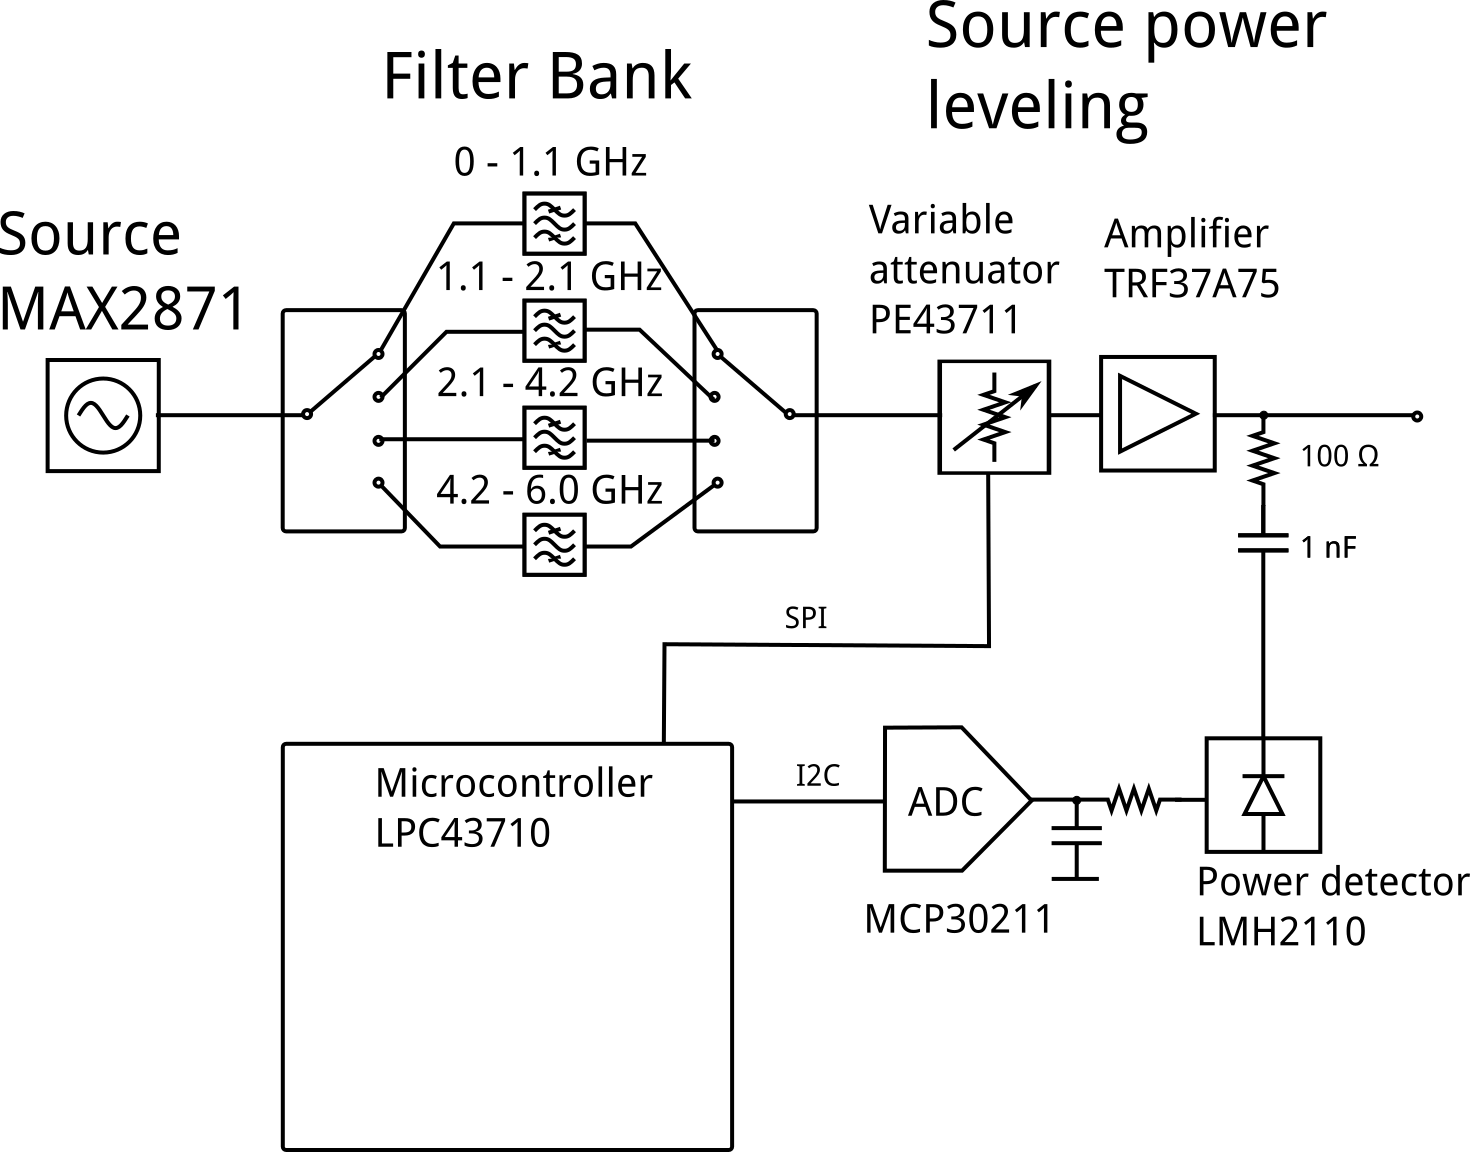 Cheap Homemade 30 Mhz 6 Ghz Vector Network Analyzer Henriks Blog Le9 Wiring Diagram